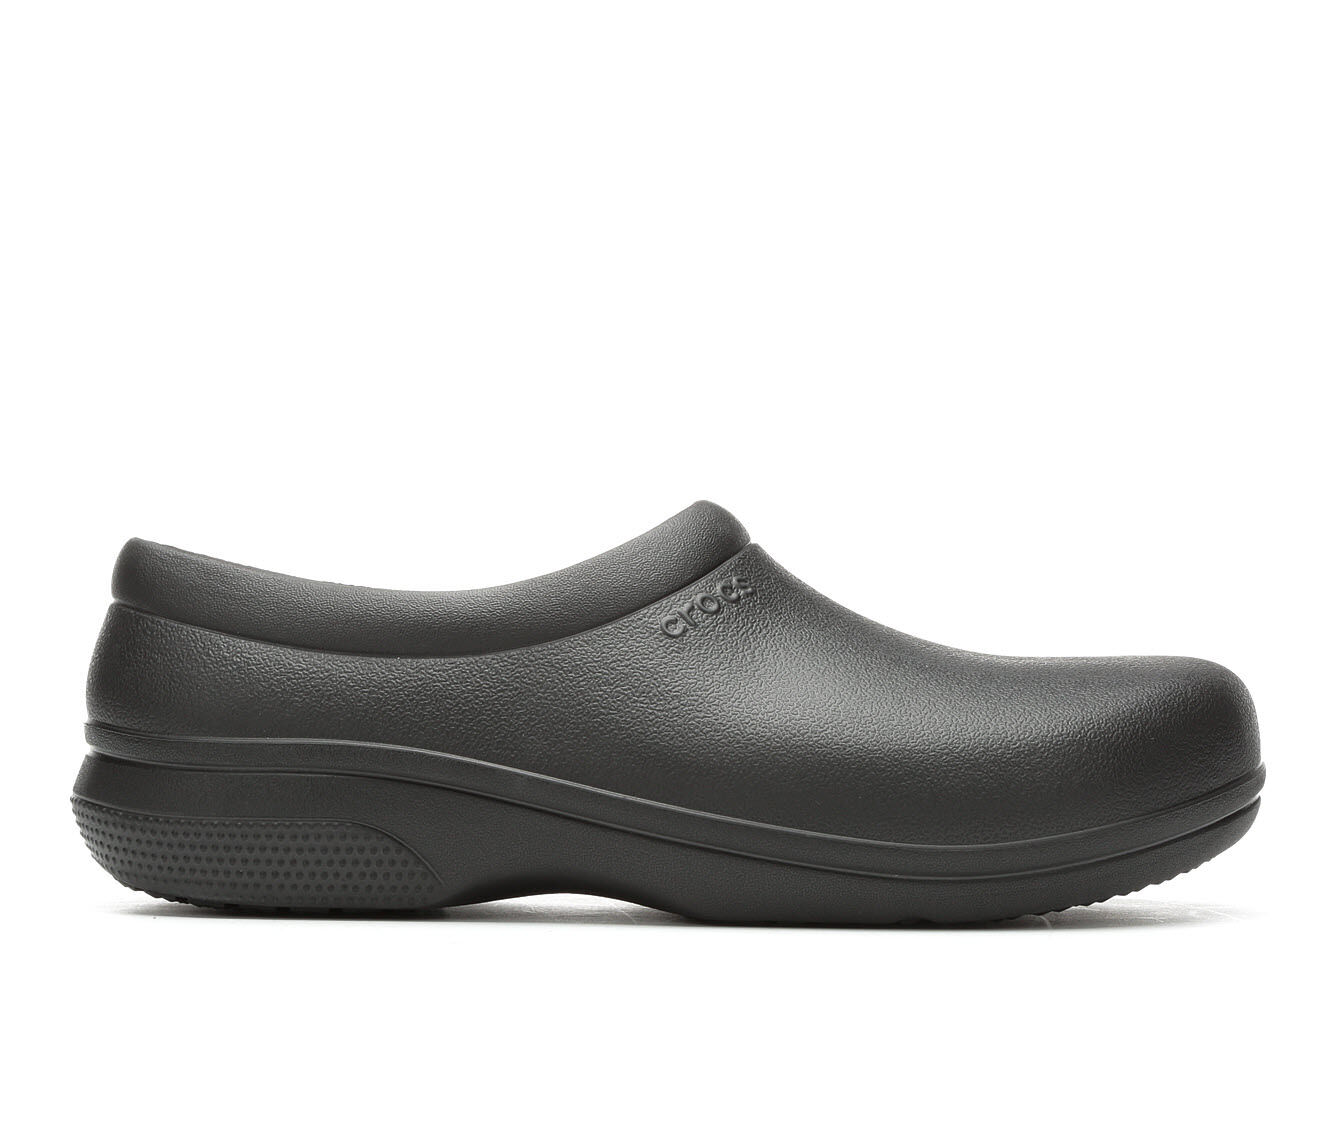 Men's Crocs Work On the Clock Slip On Safety Shoes Black